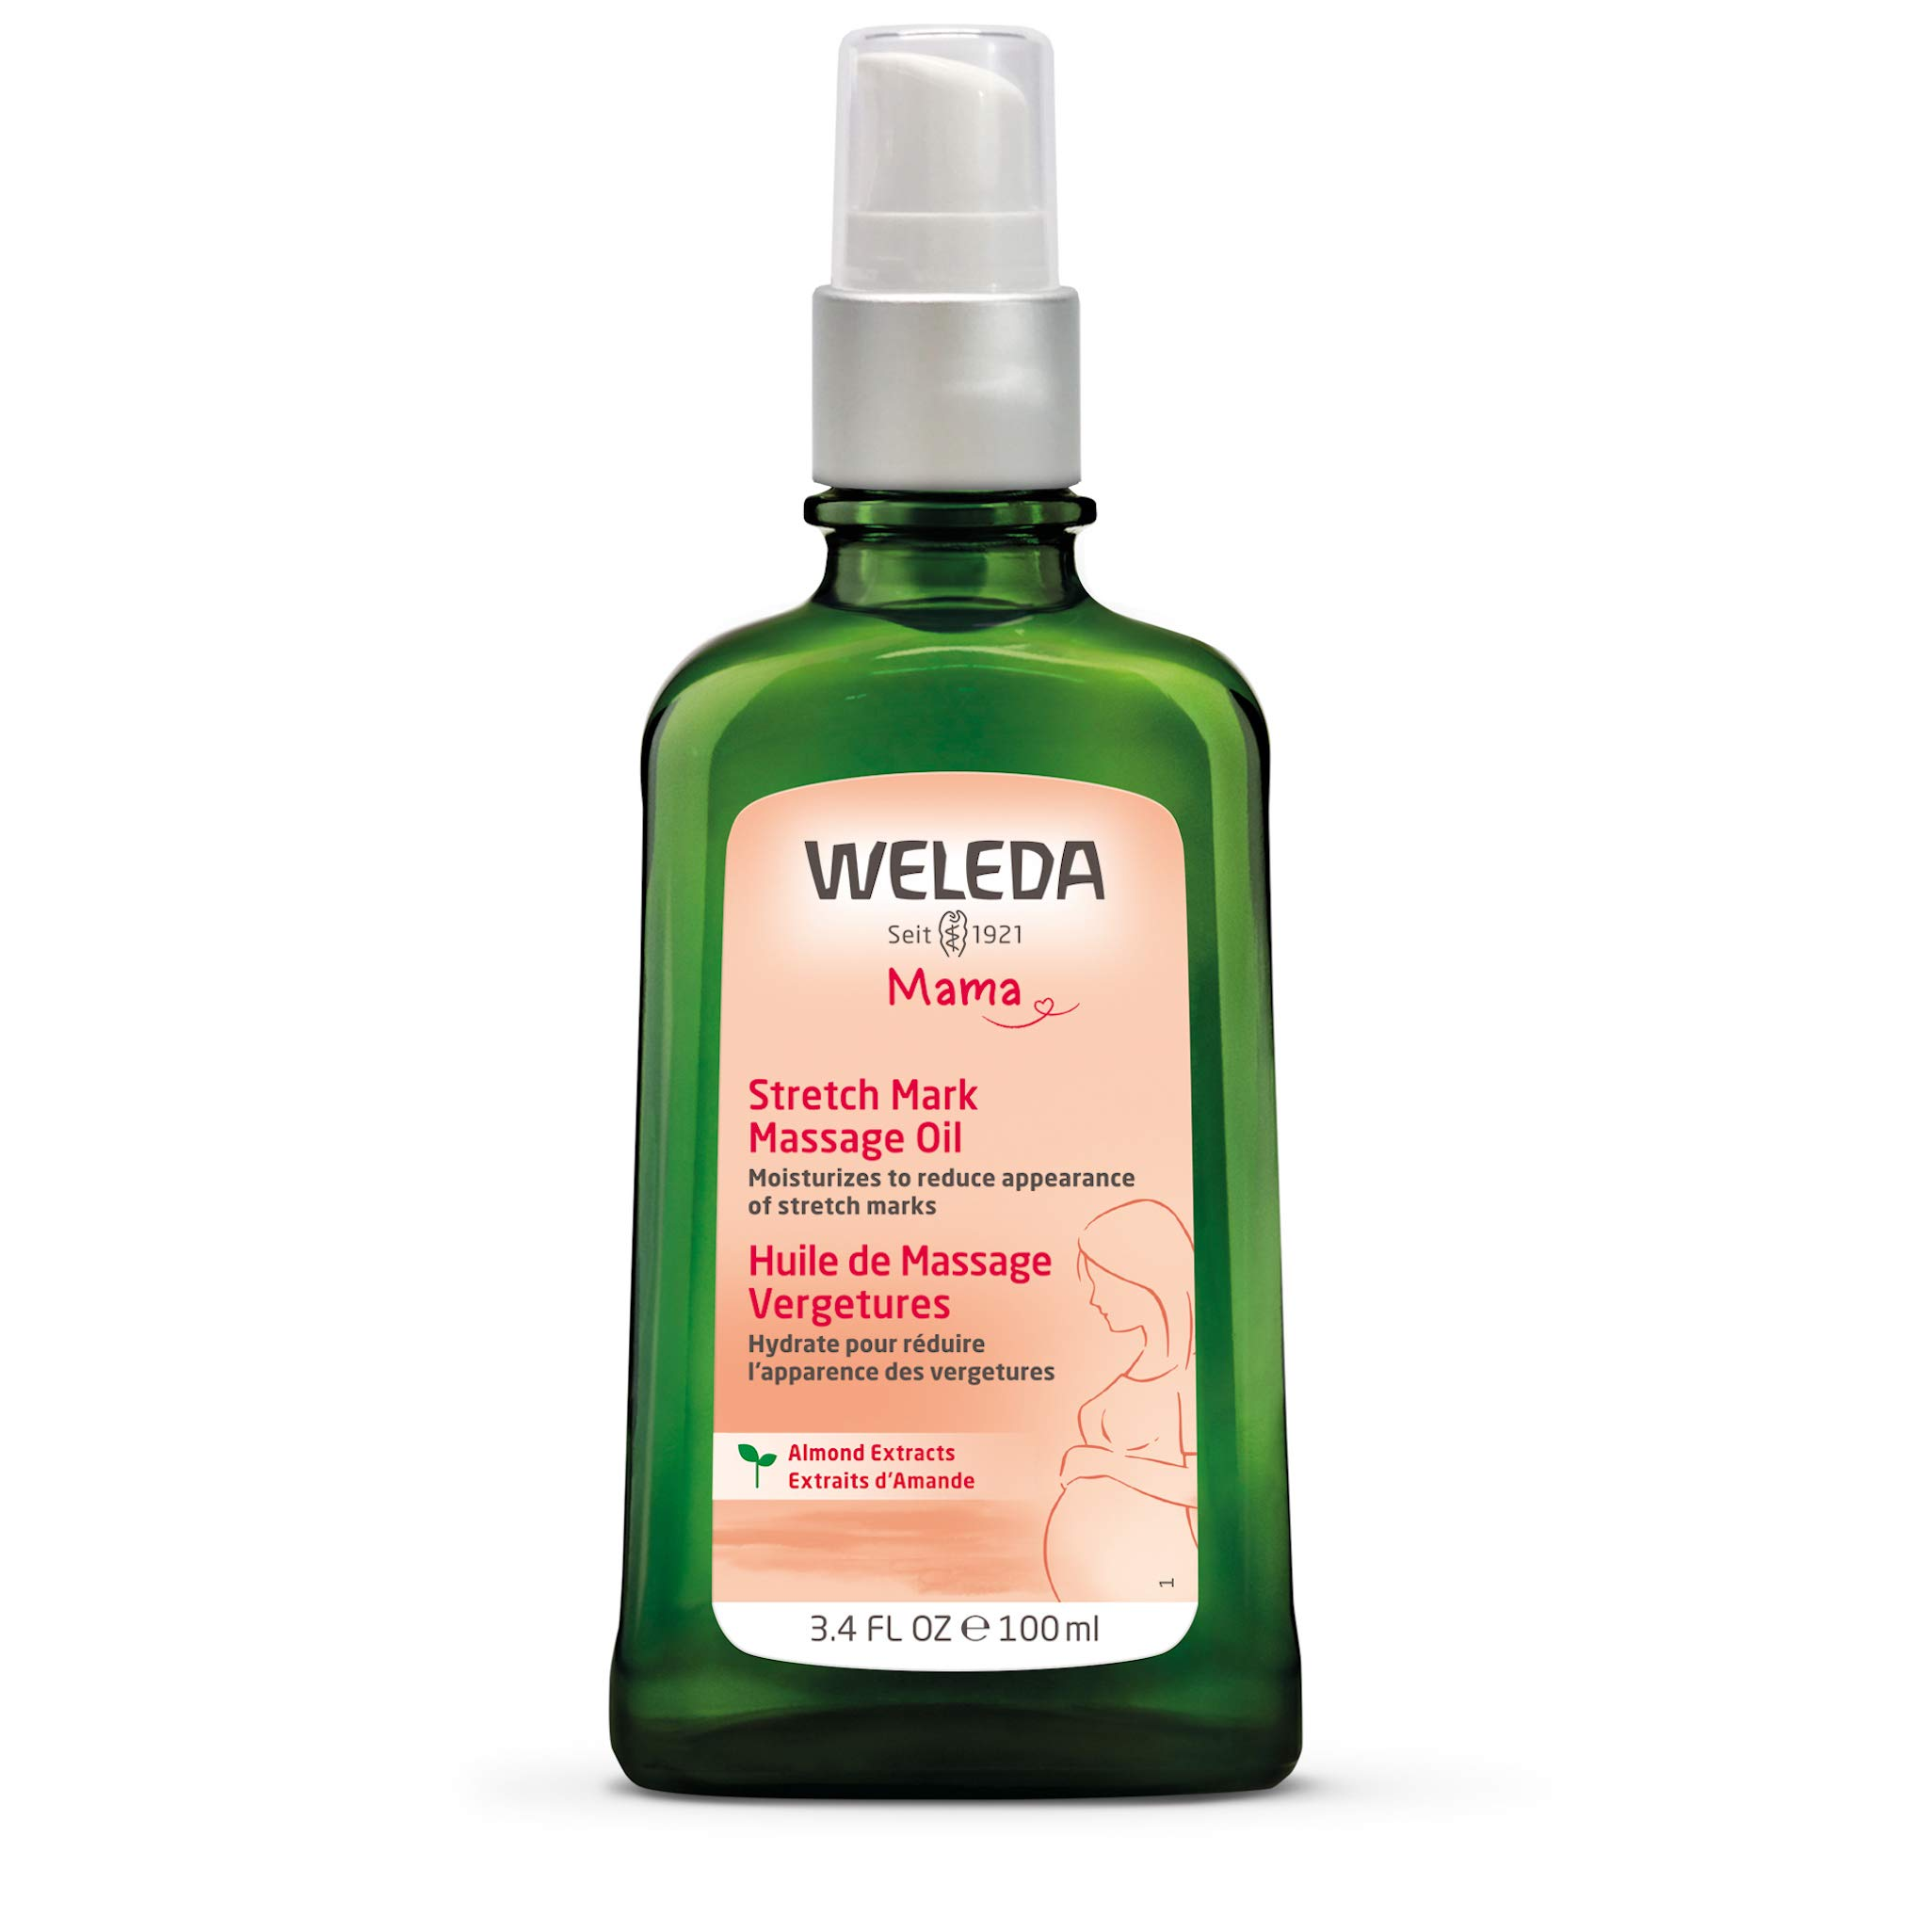 Weleda: Pregnancy Body Oil for Stretch Marks, 3.4 Fl Oz (Pack of 1) by Weleda